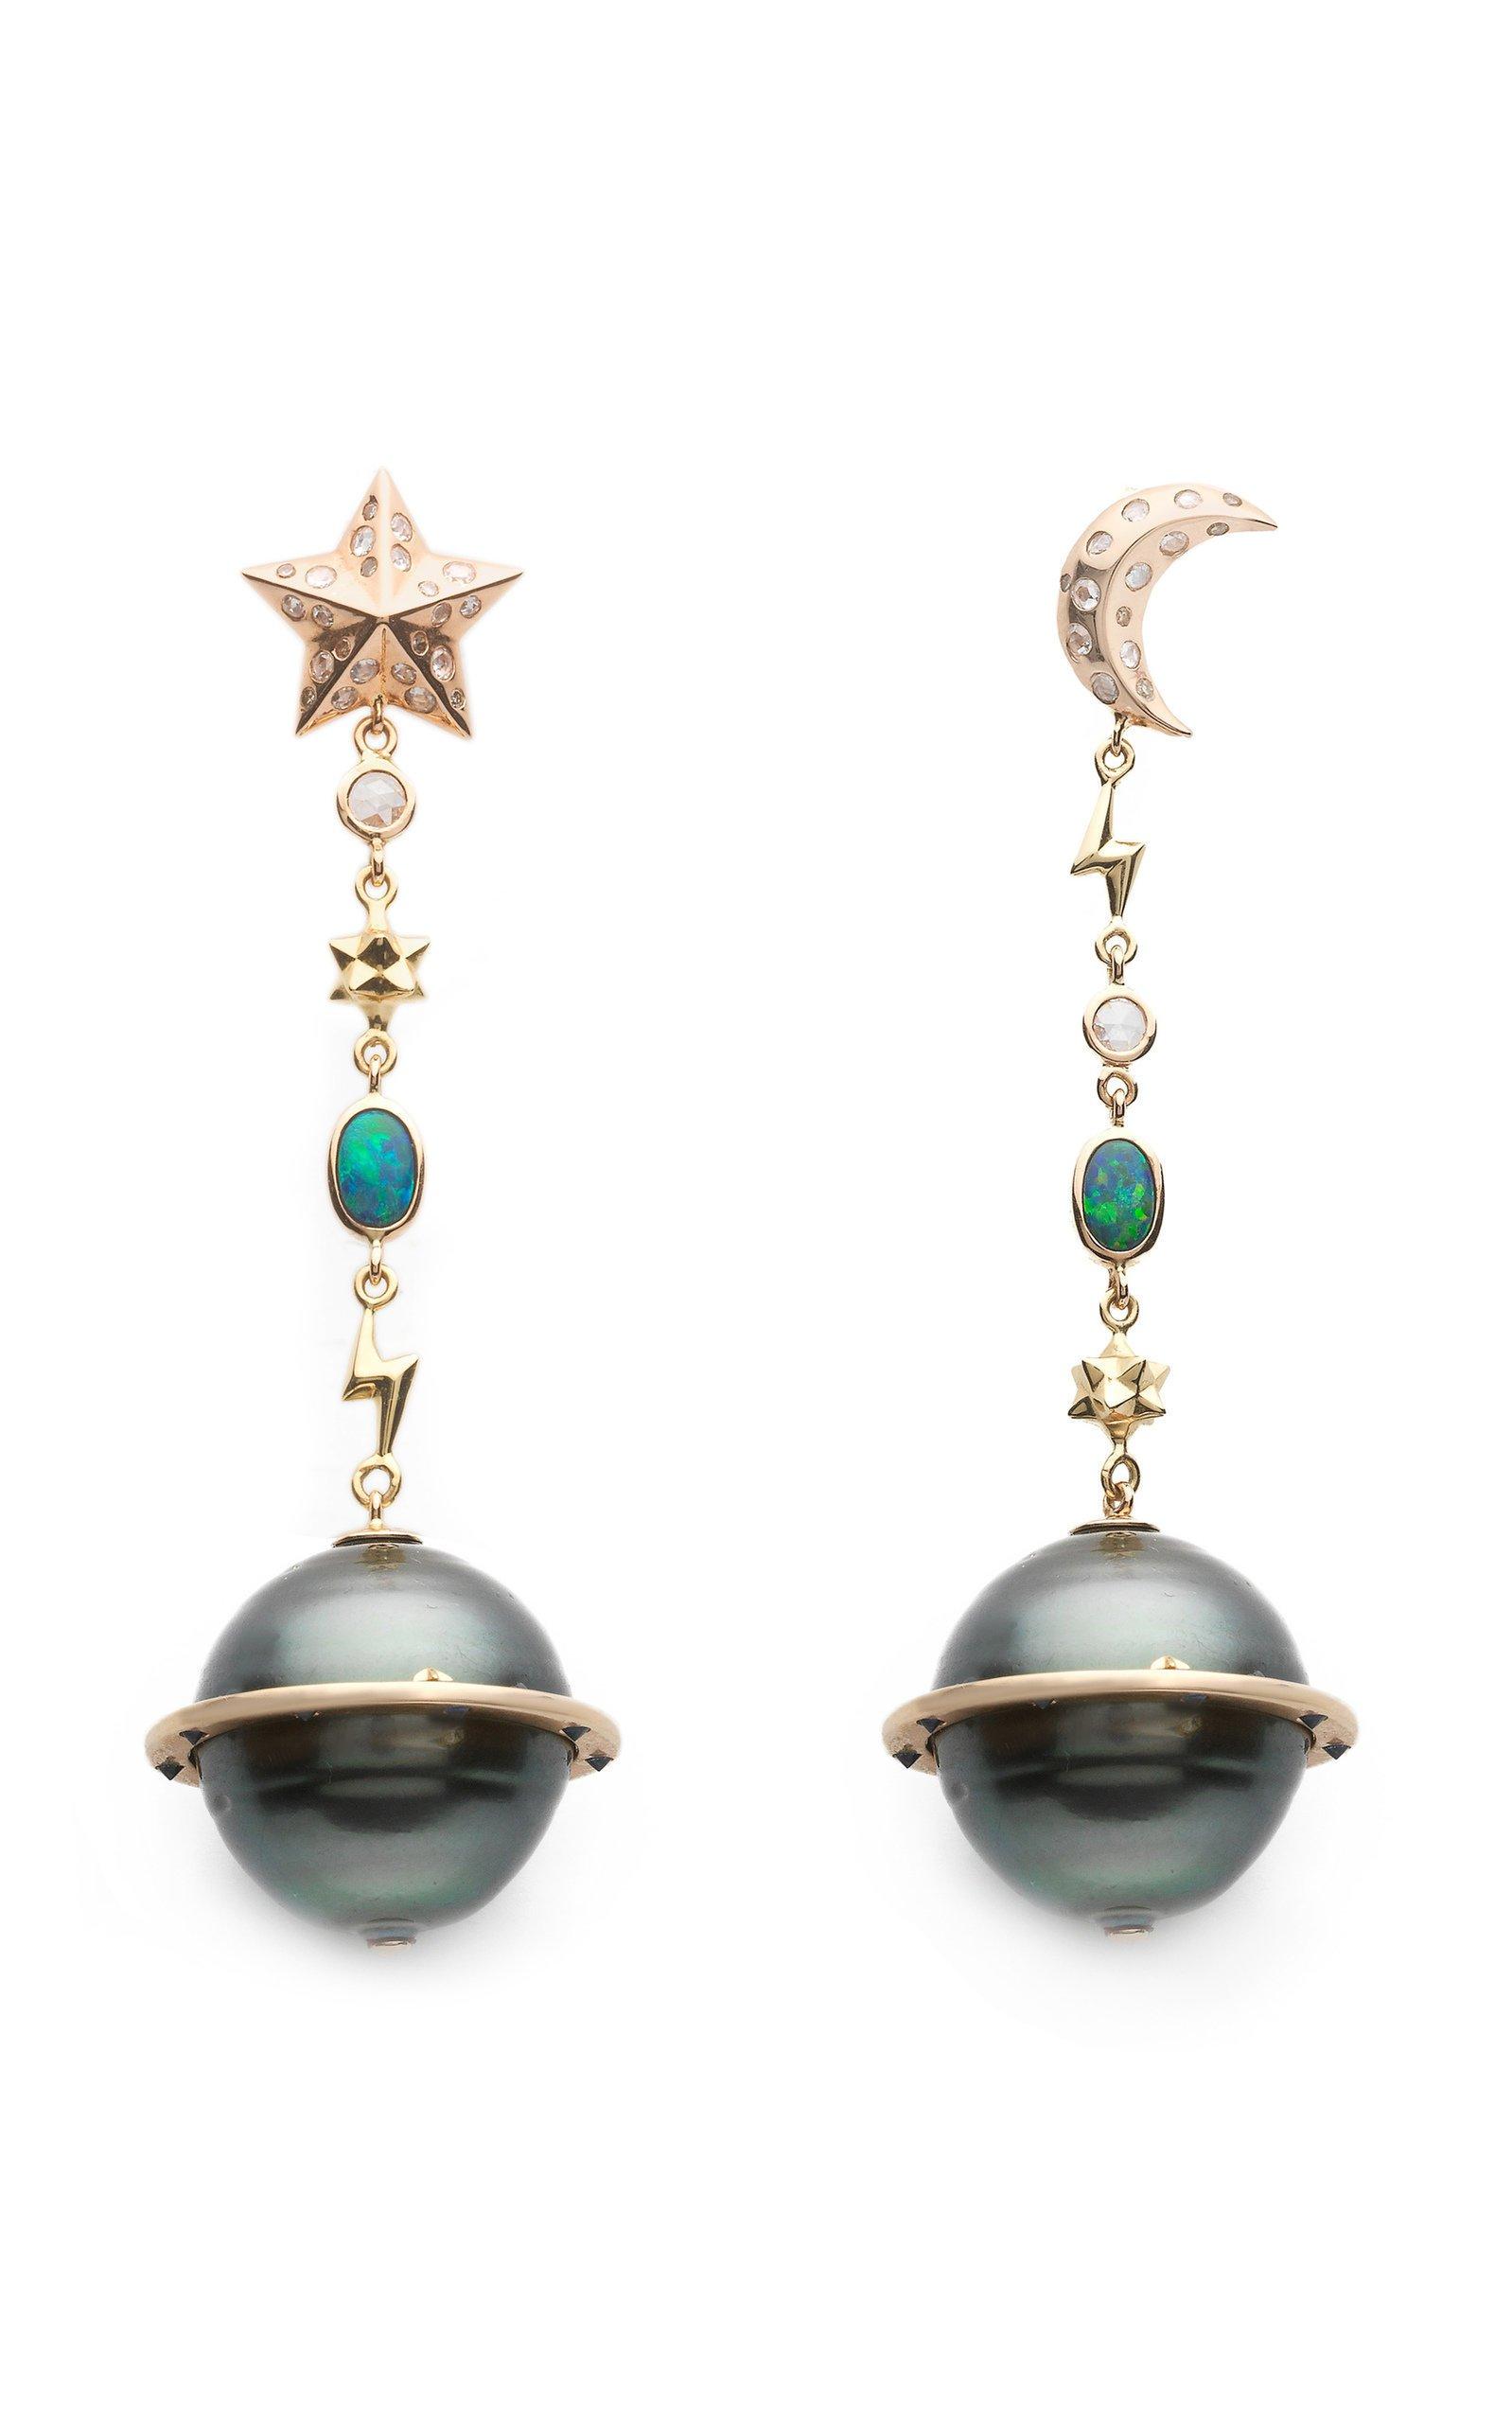 Bibi van der Velden Planet Earrings Star and Moon